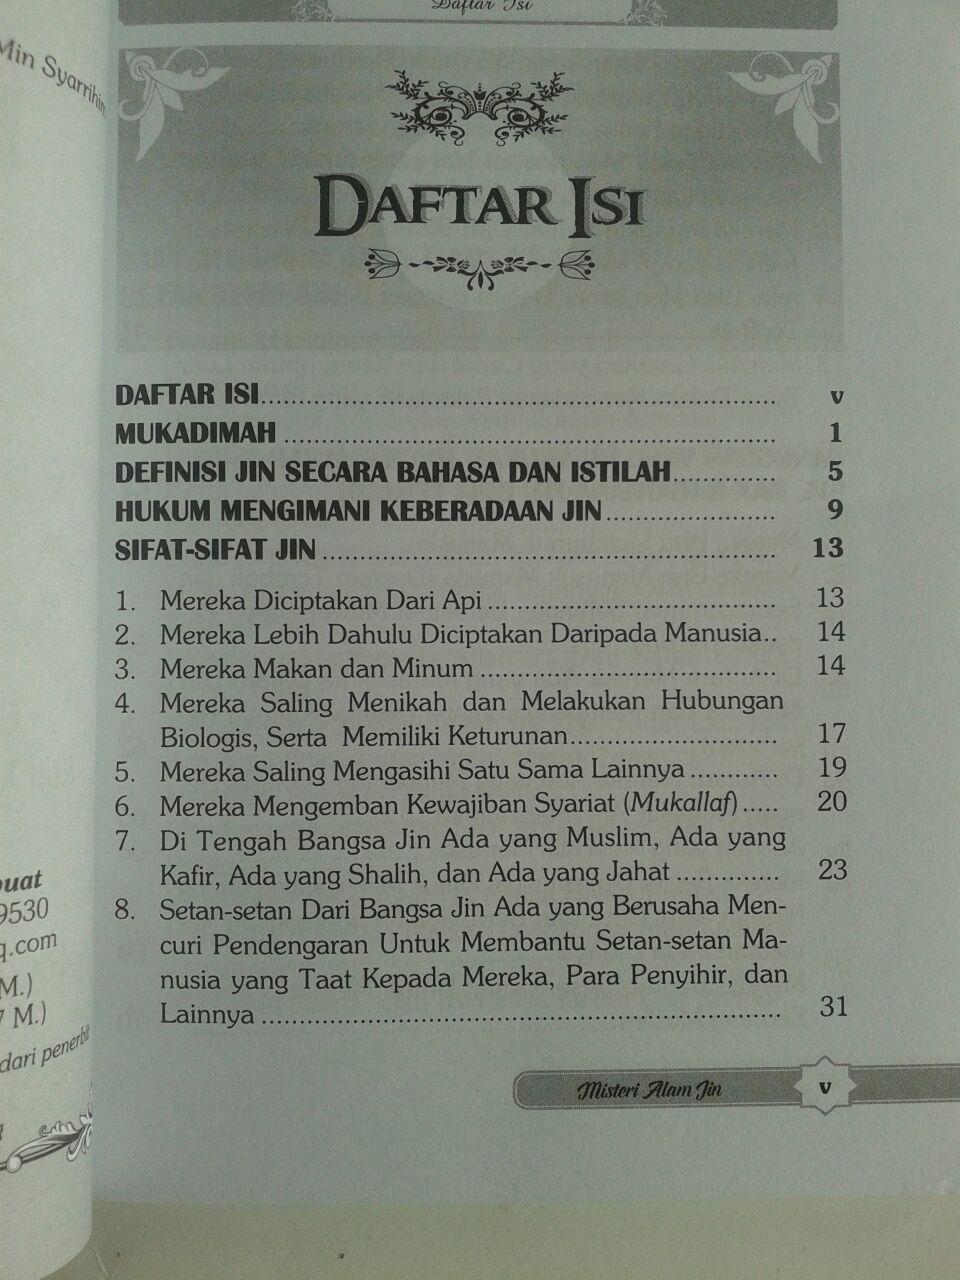 Buku Misteri Alam Jin Berdasarkan Al-Quran dan As-Sunnah isi